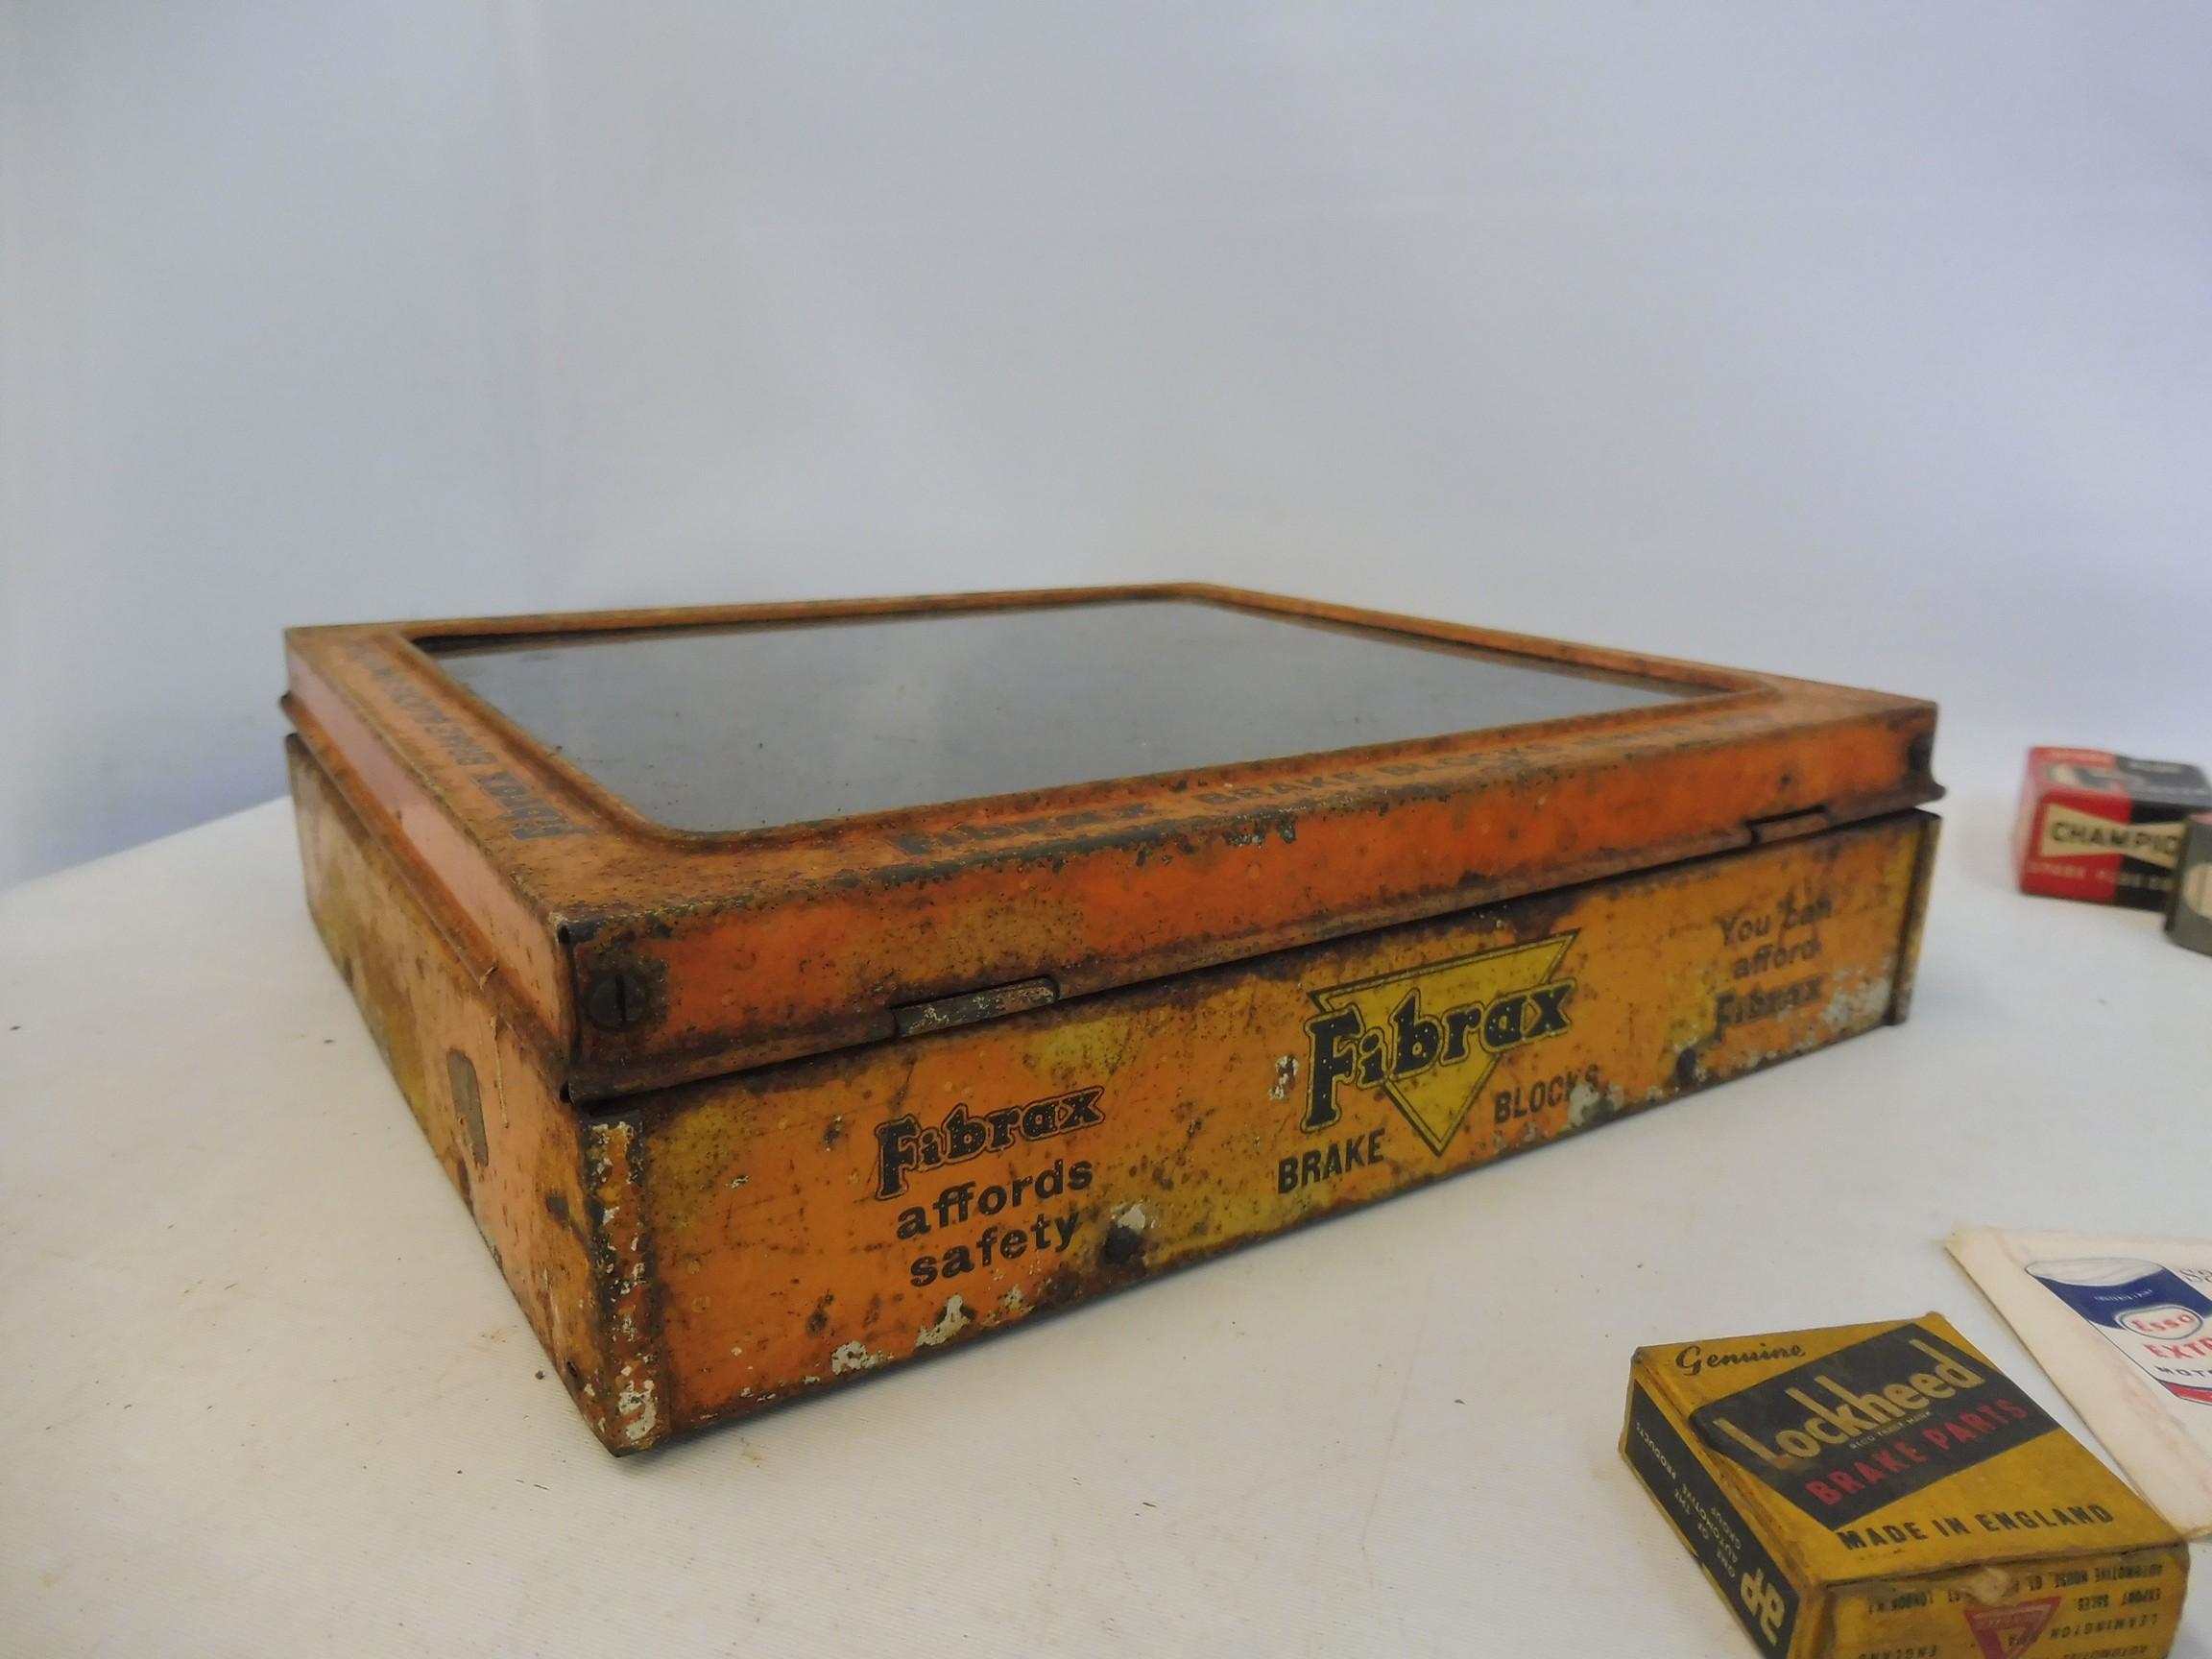 A Fibrax Brake Blocks dispensing tin with mixed contents. - Image 7 of 8